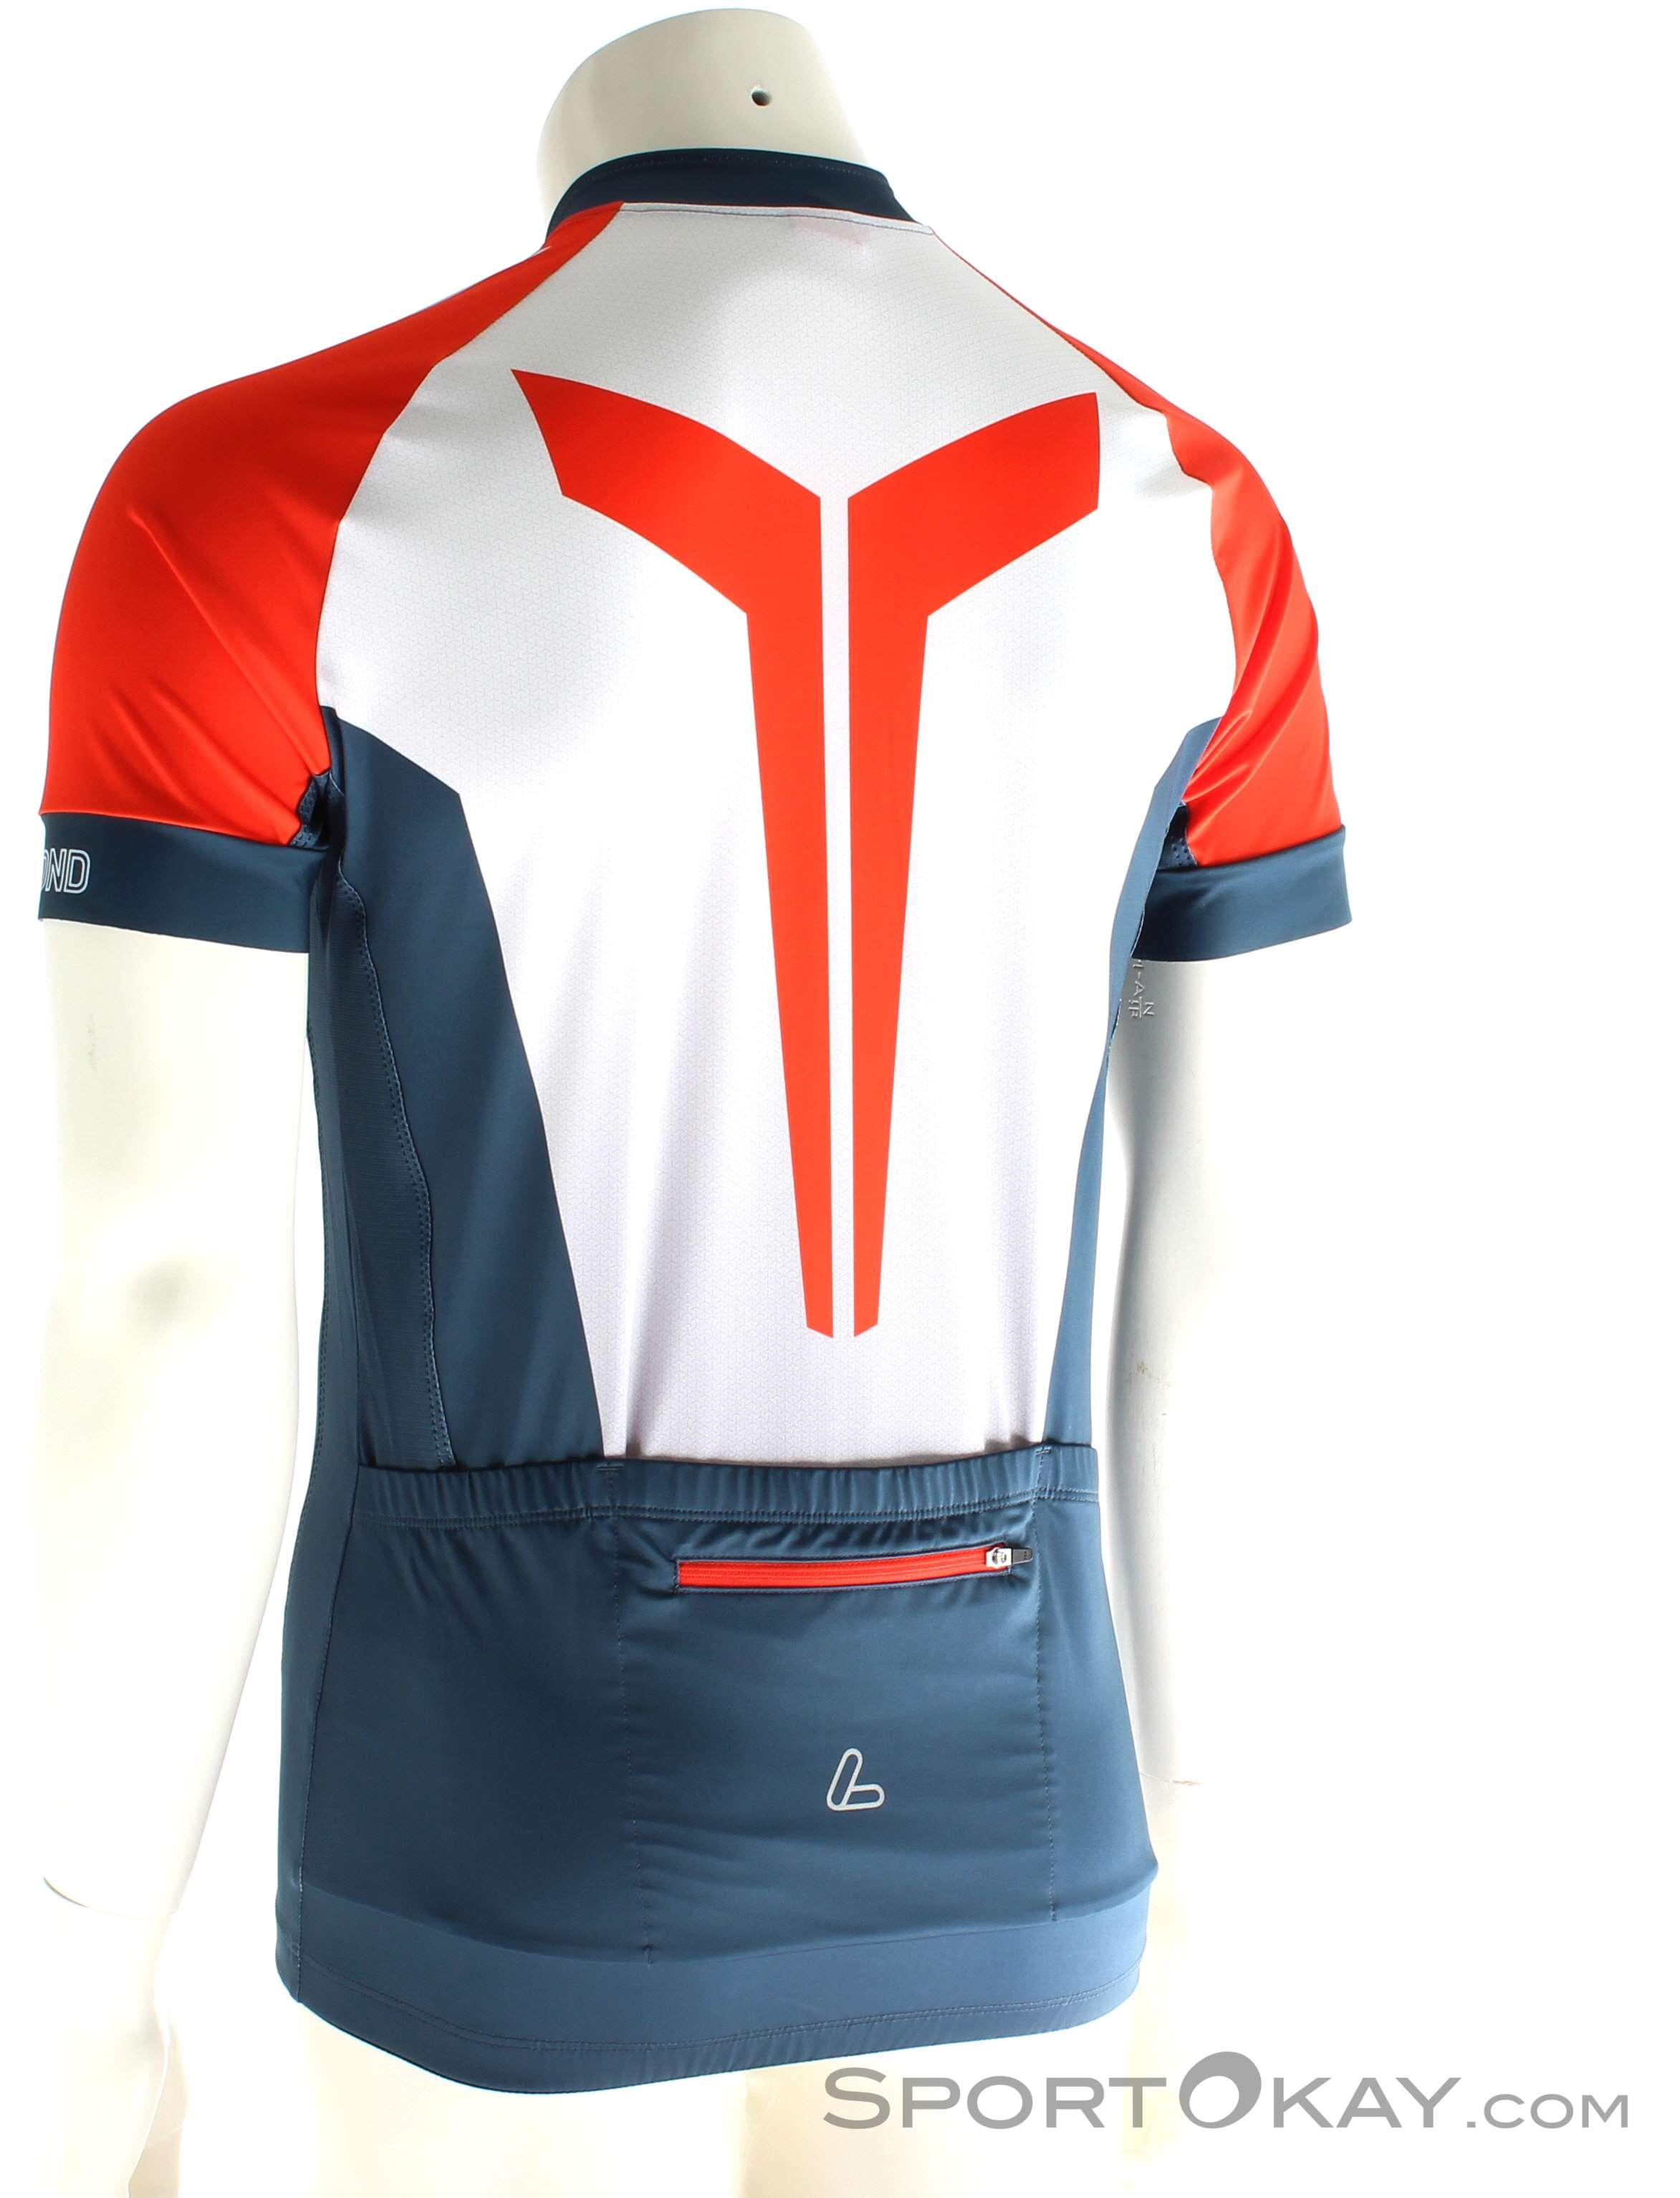 0c41e5ede Löffler Bike Hotbond RF FZ Mens Biking Shirt - Shirts   T-Shirts ...